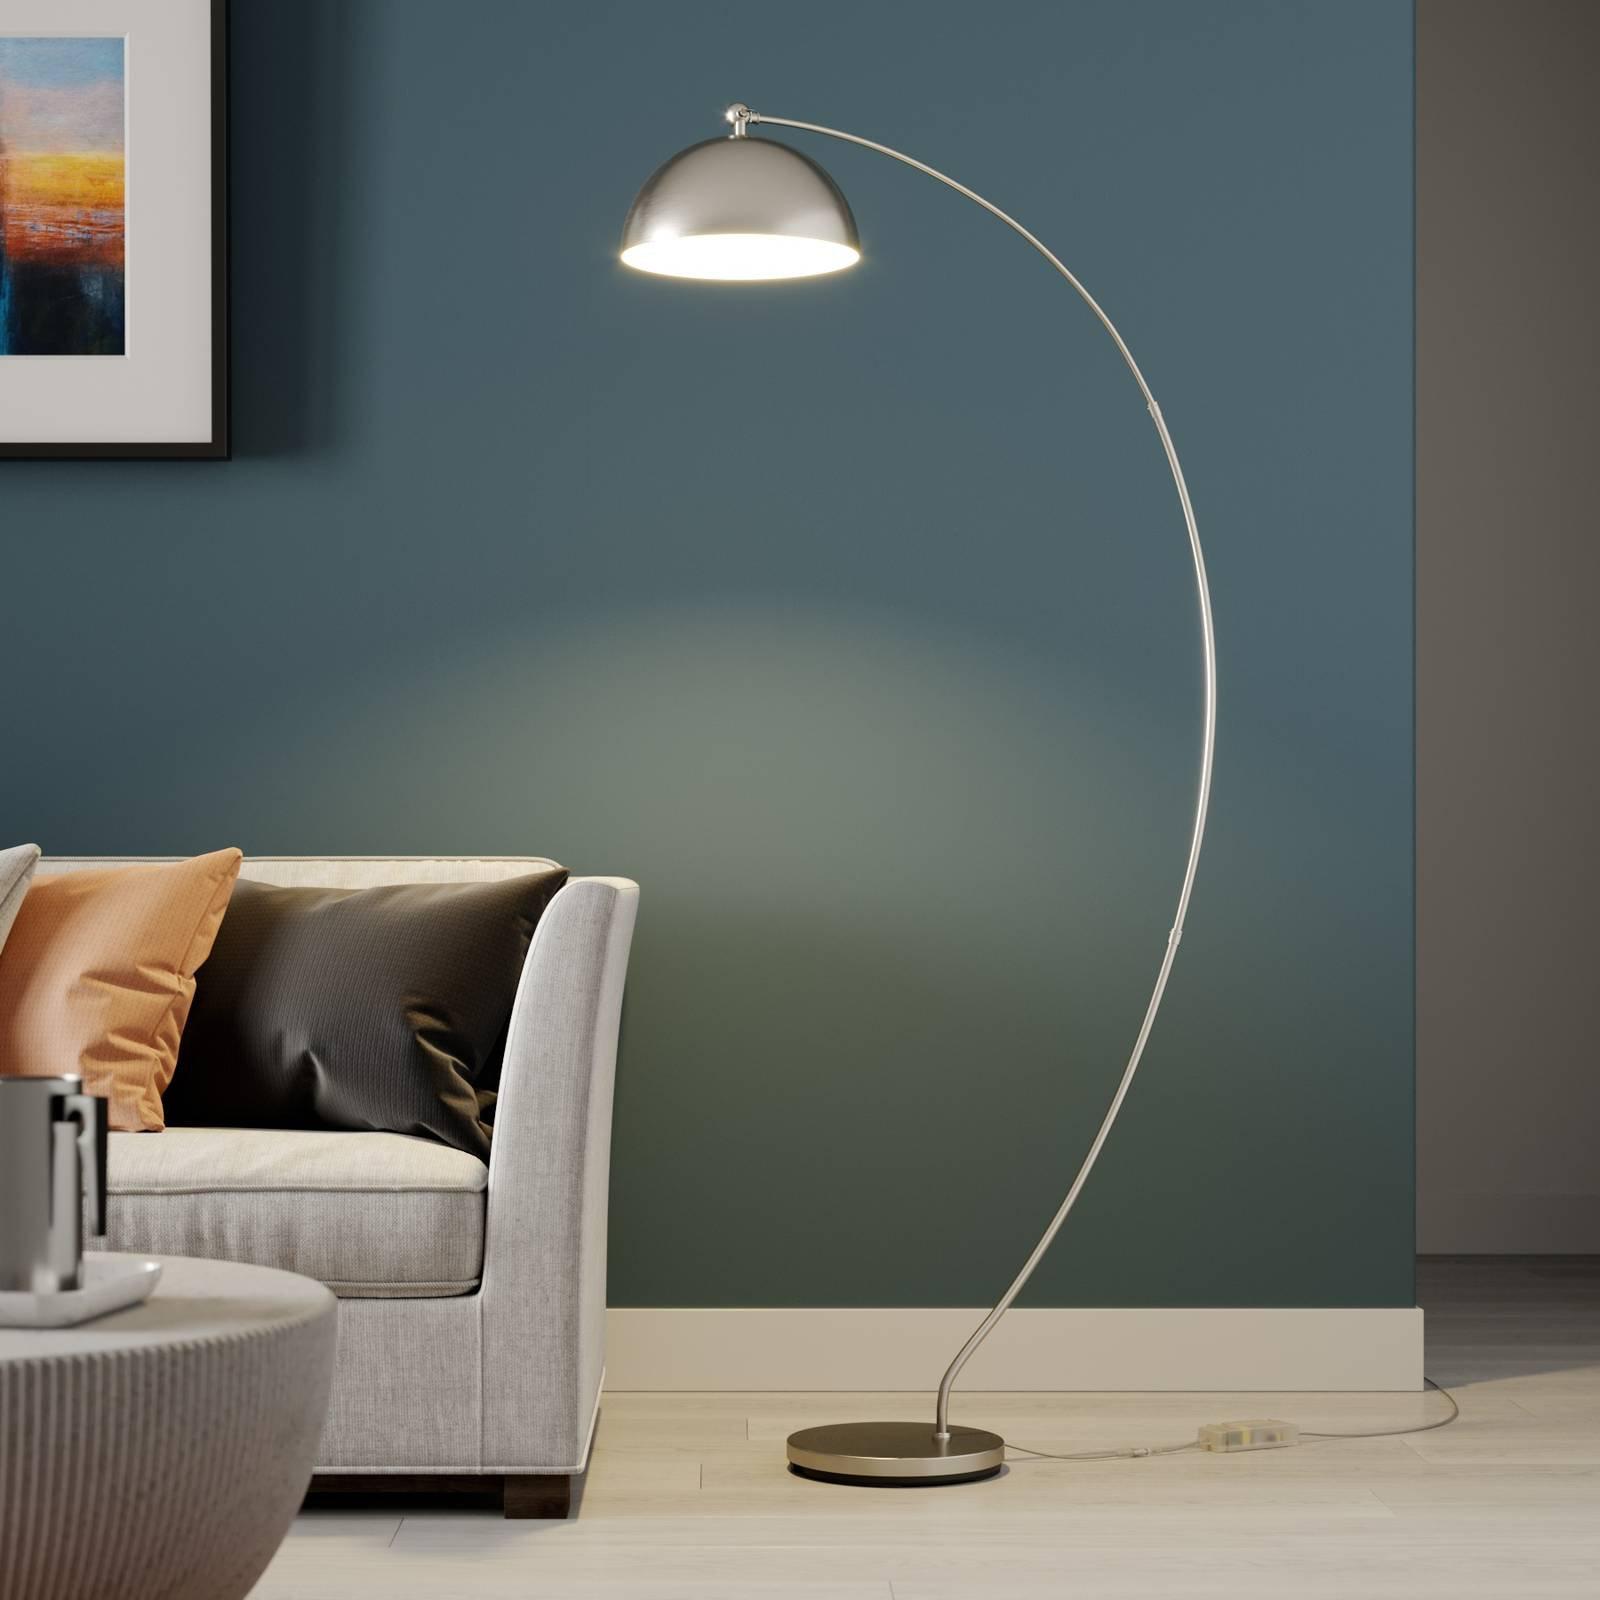 Lindby Zara LED-buelampe med fotdimmer